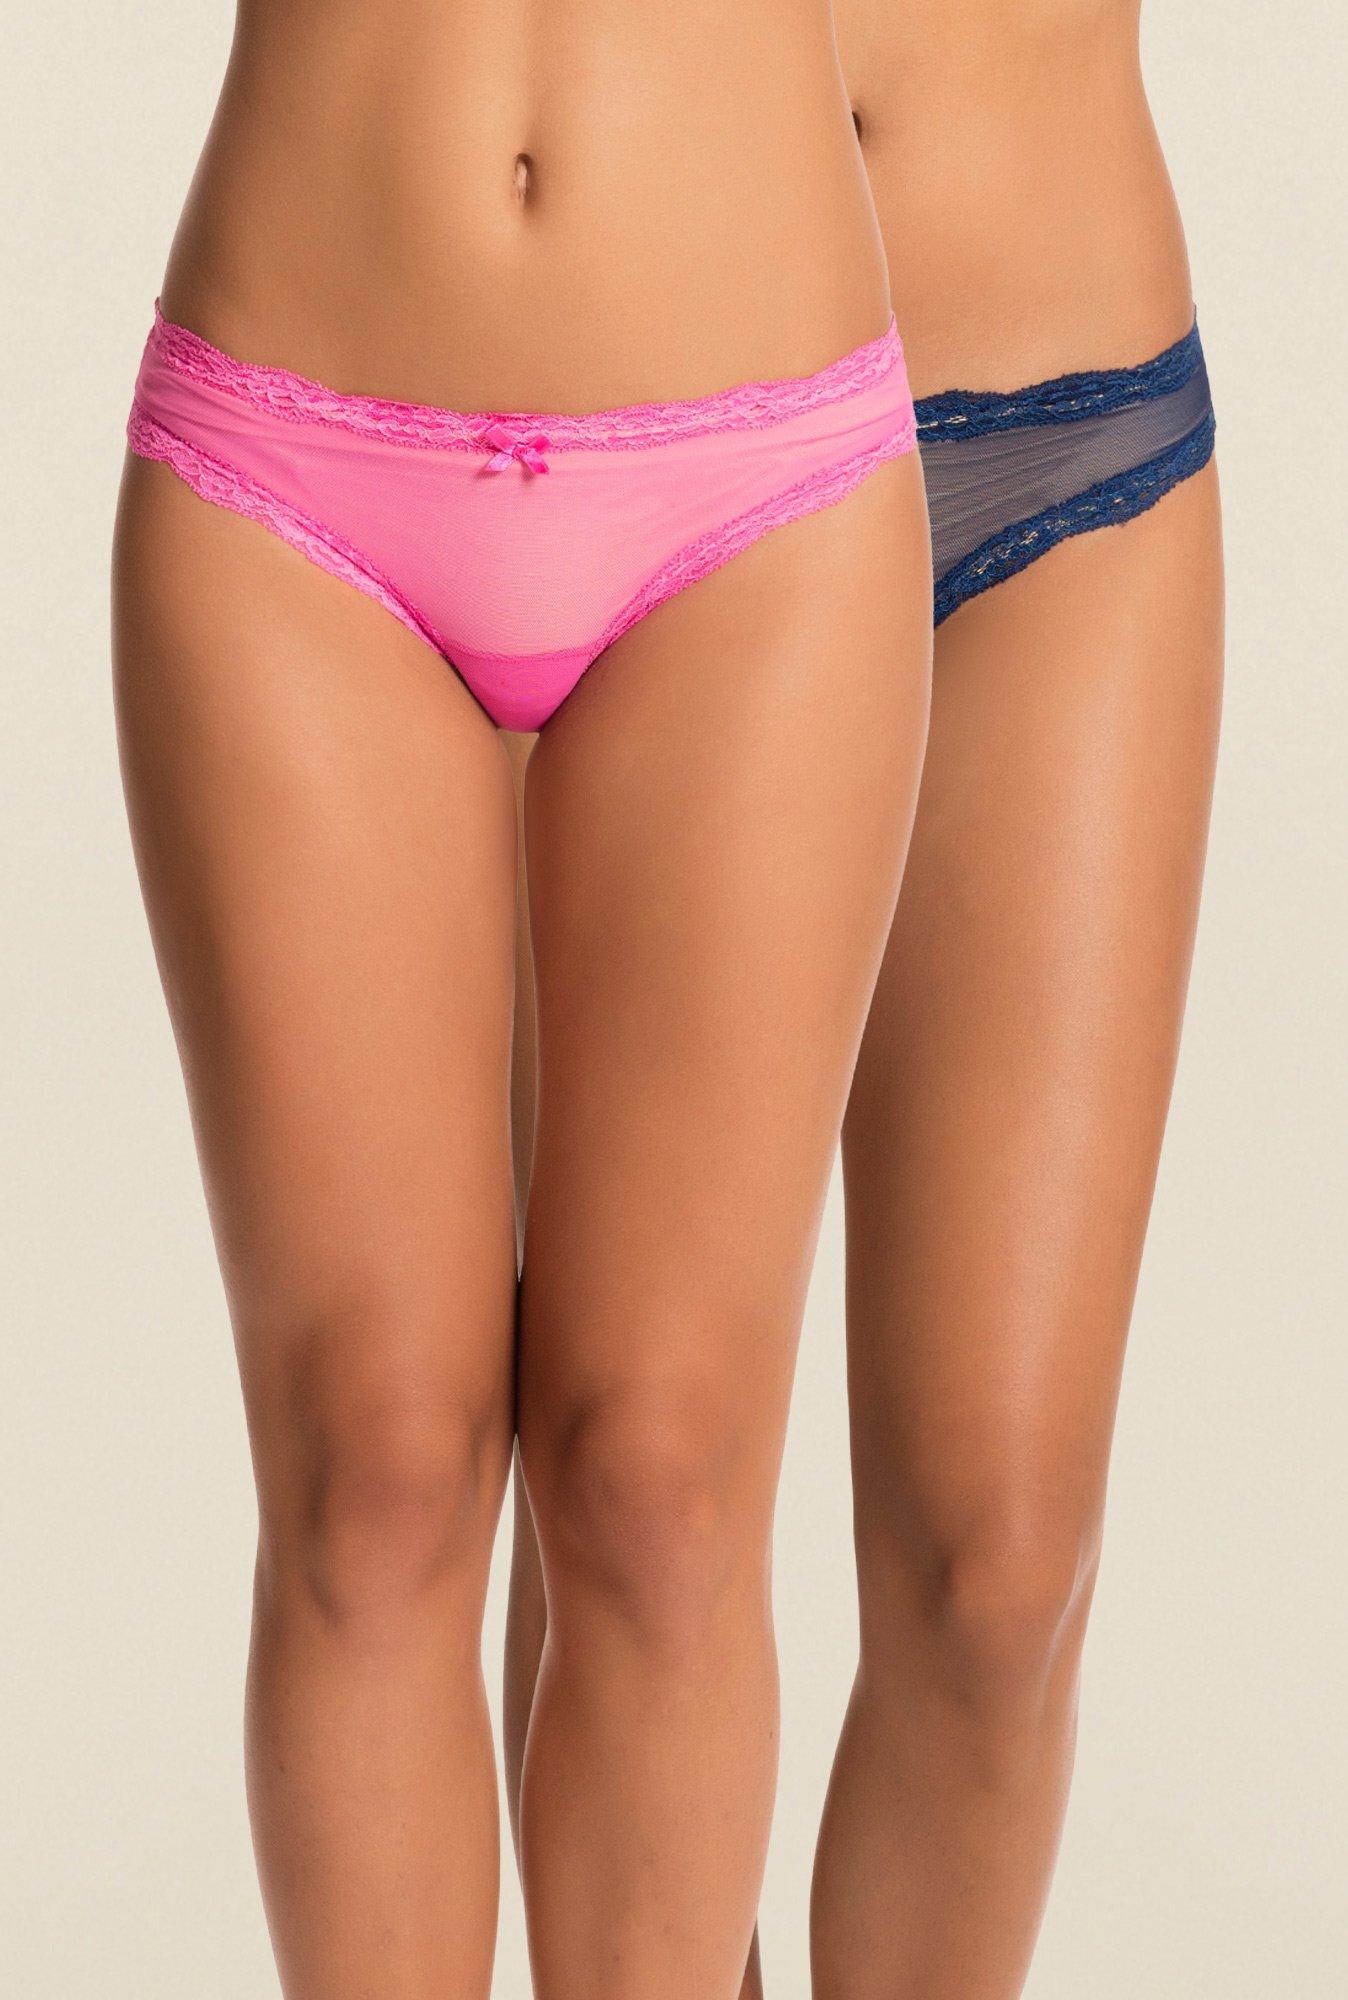 Buy PrettySecrets Pink   Navy Lace Bikini Panties (Pack Of 2) for Women  Online   Tata CLiQ 9702424a2